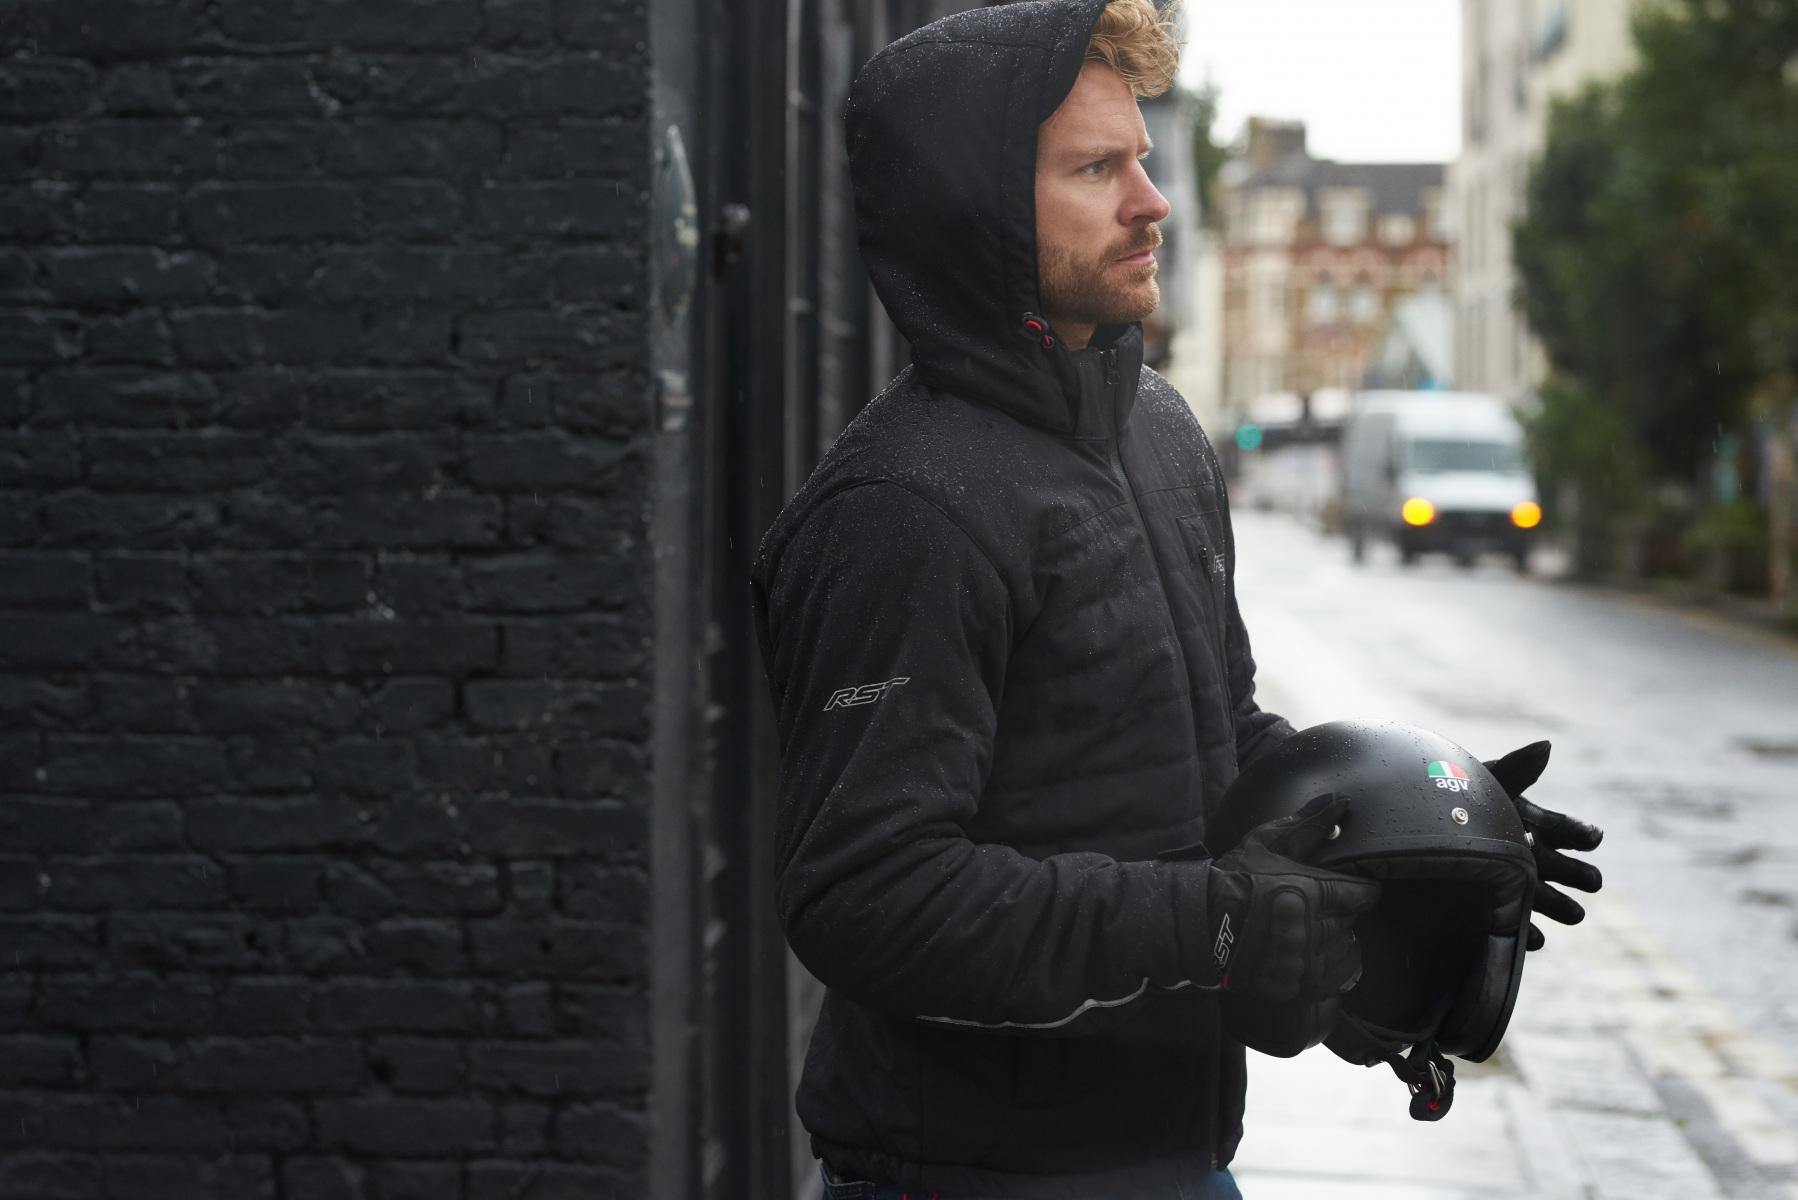 102976-rst-frontier-textile-jacket-black-lifestyle-01